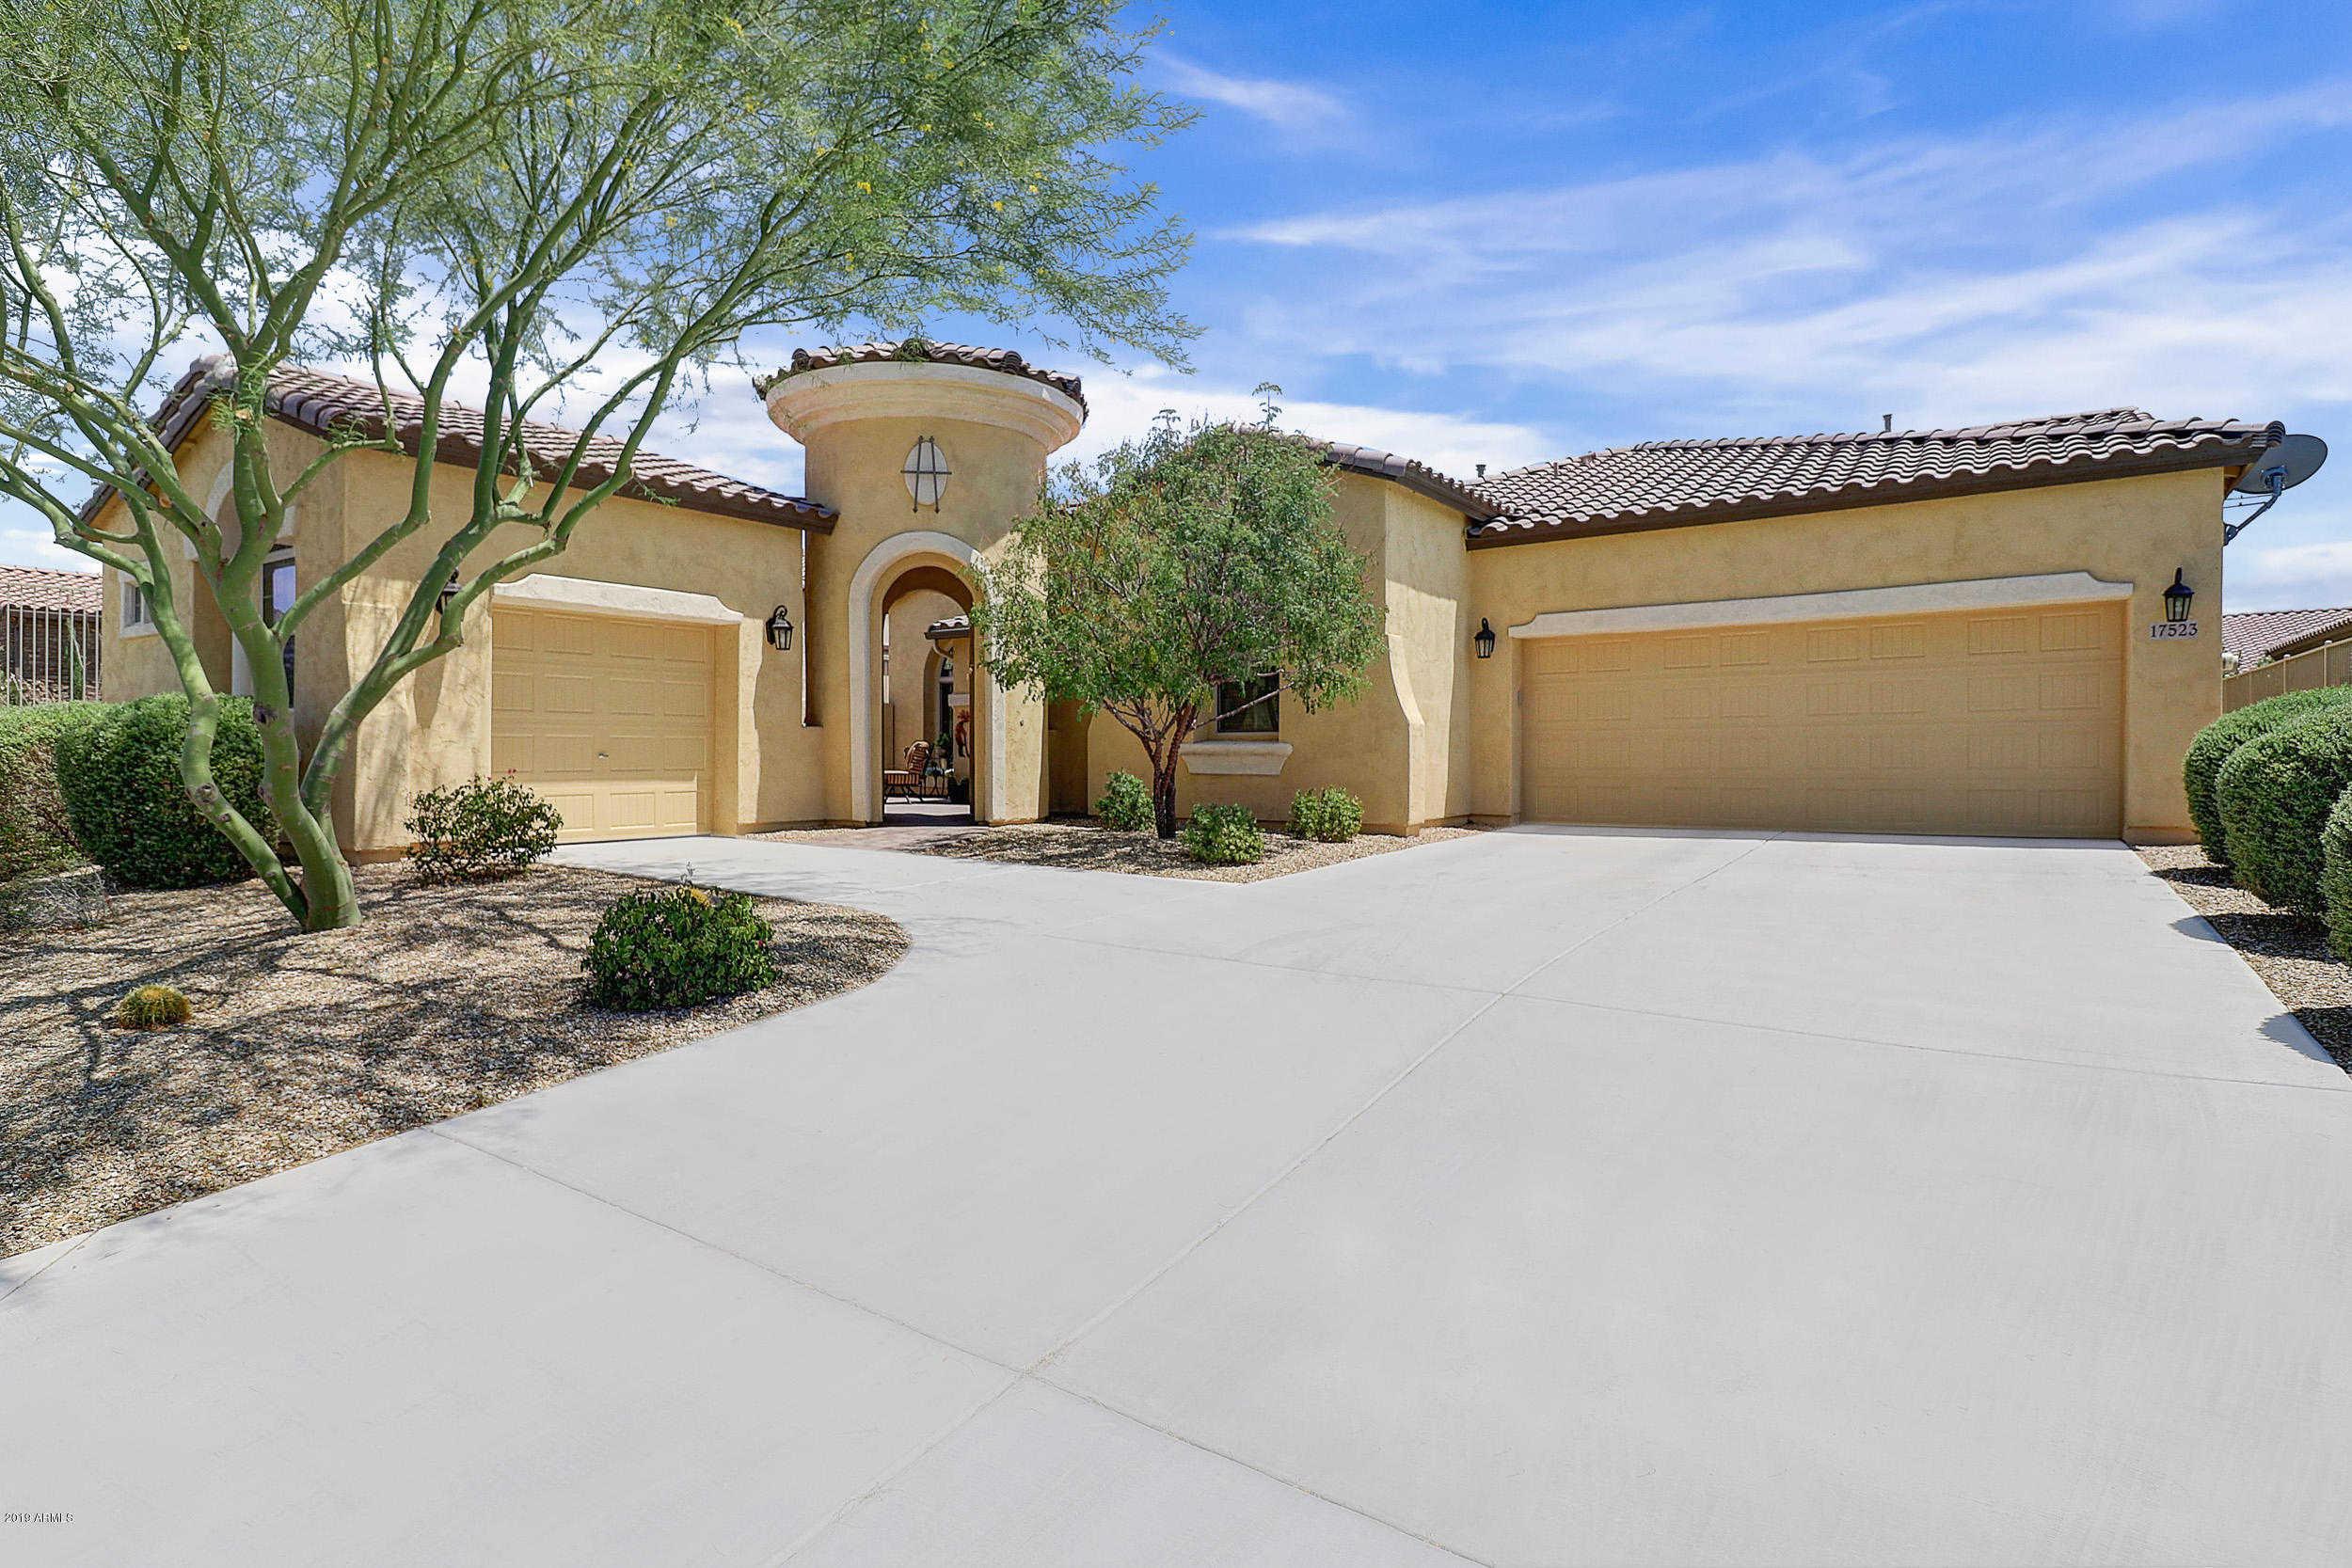 $394,000 - 3Br/3Ba - Home for Sale in Canta Mia Province At Estrella Mountain Ranch Parcel 6, Goodyear